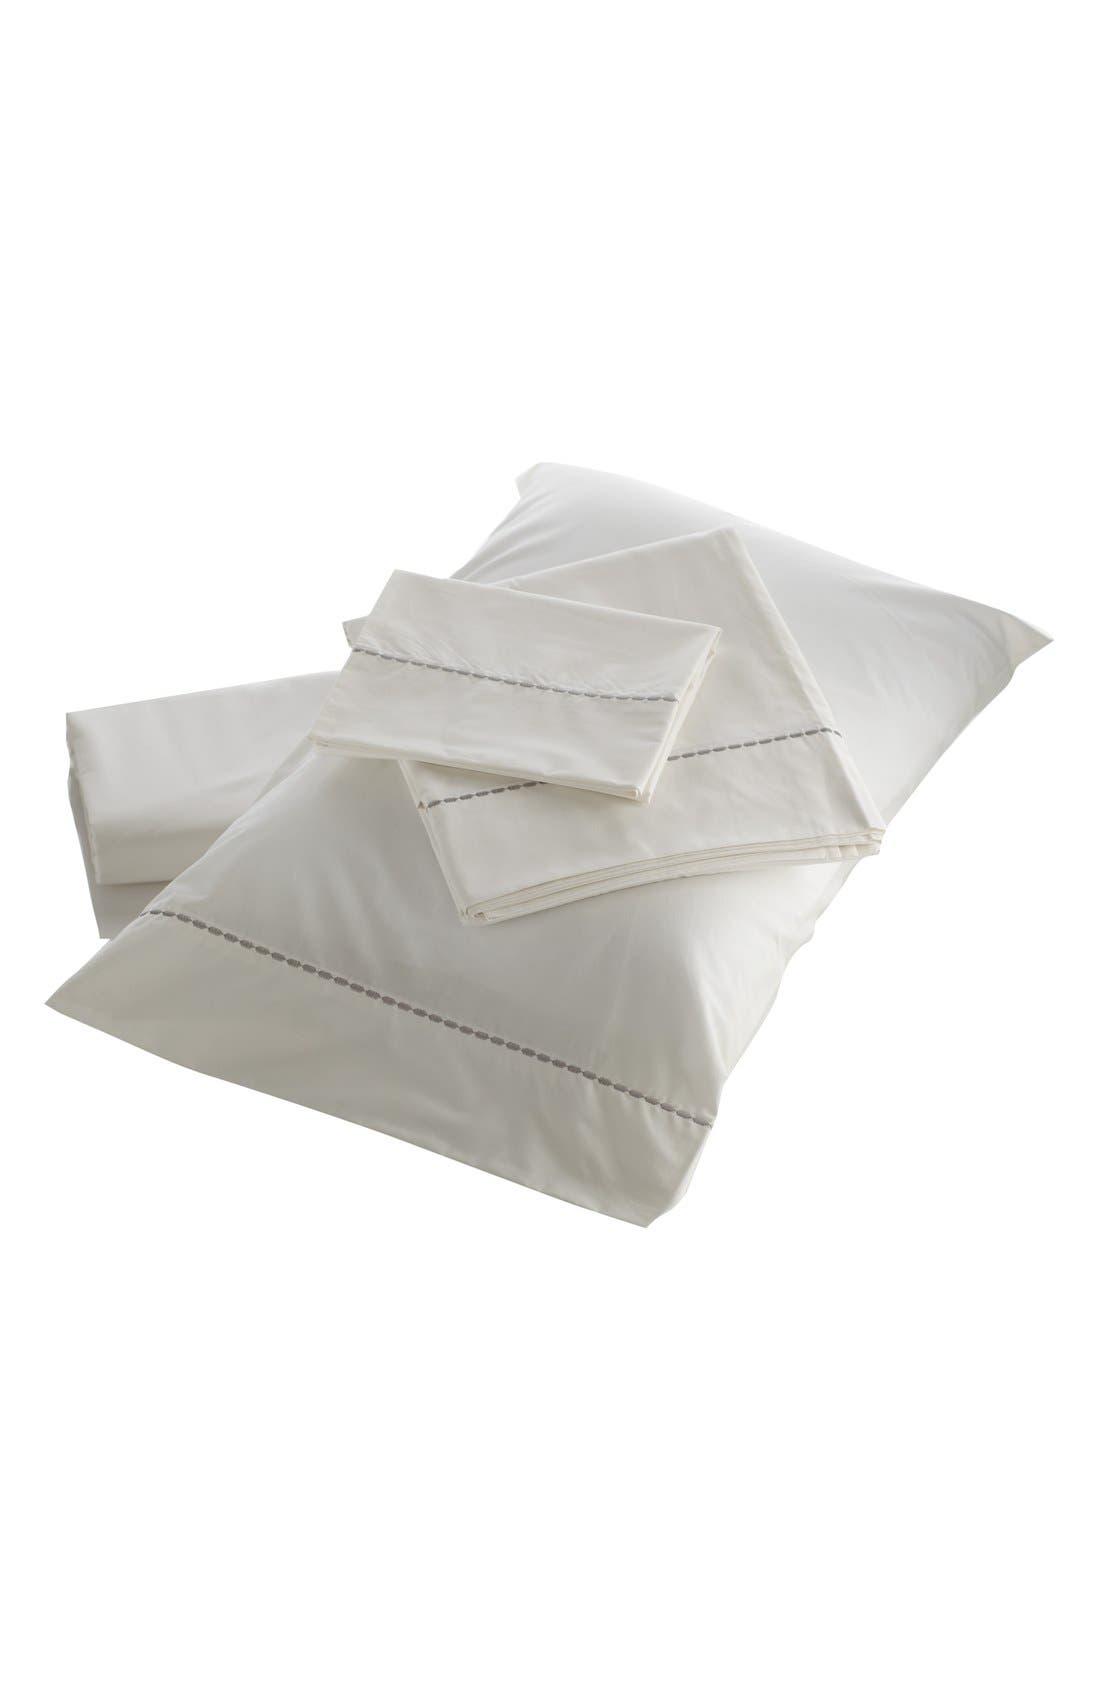 'Portland' 200 Thread Count Organic Cotton Sheet Set,                         Main,                         color, White